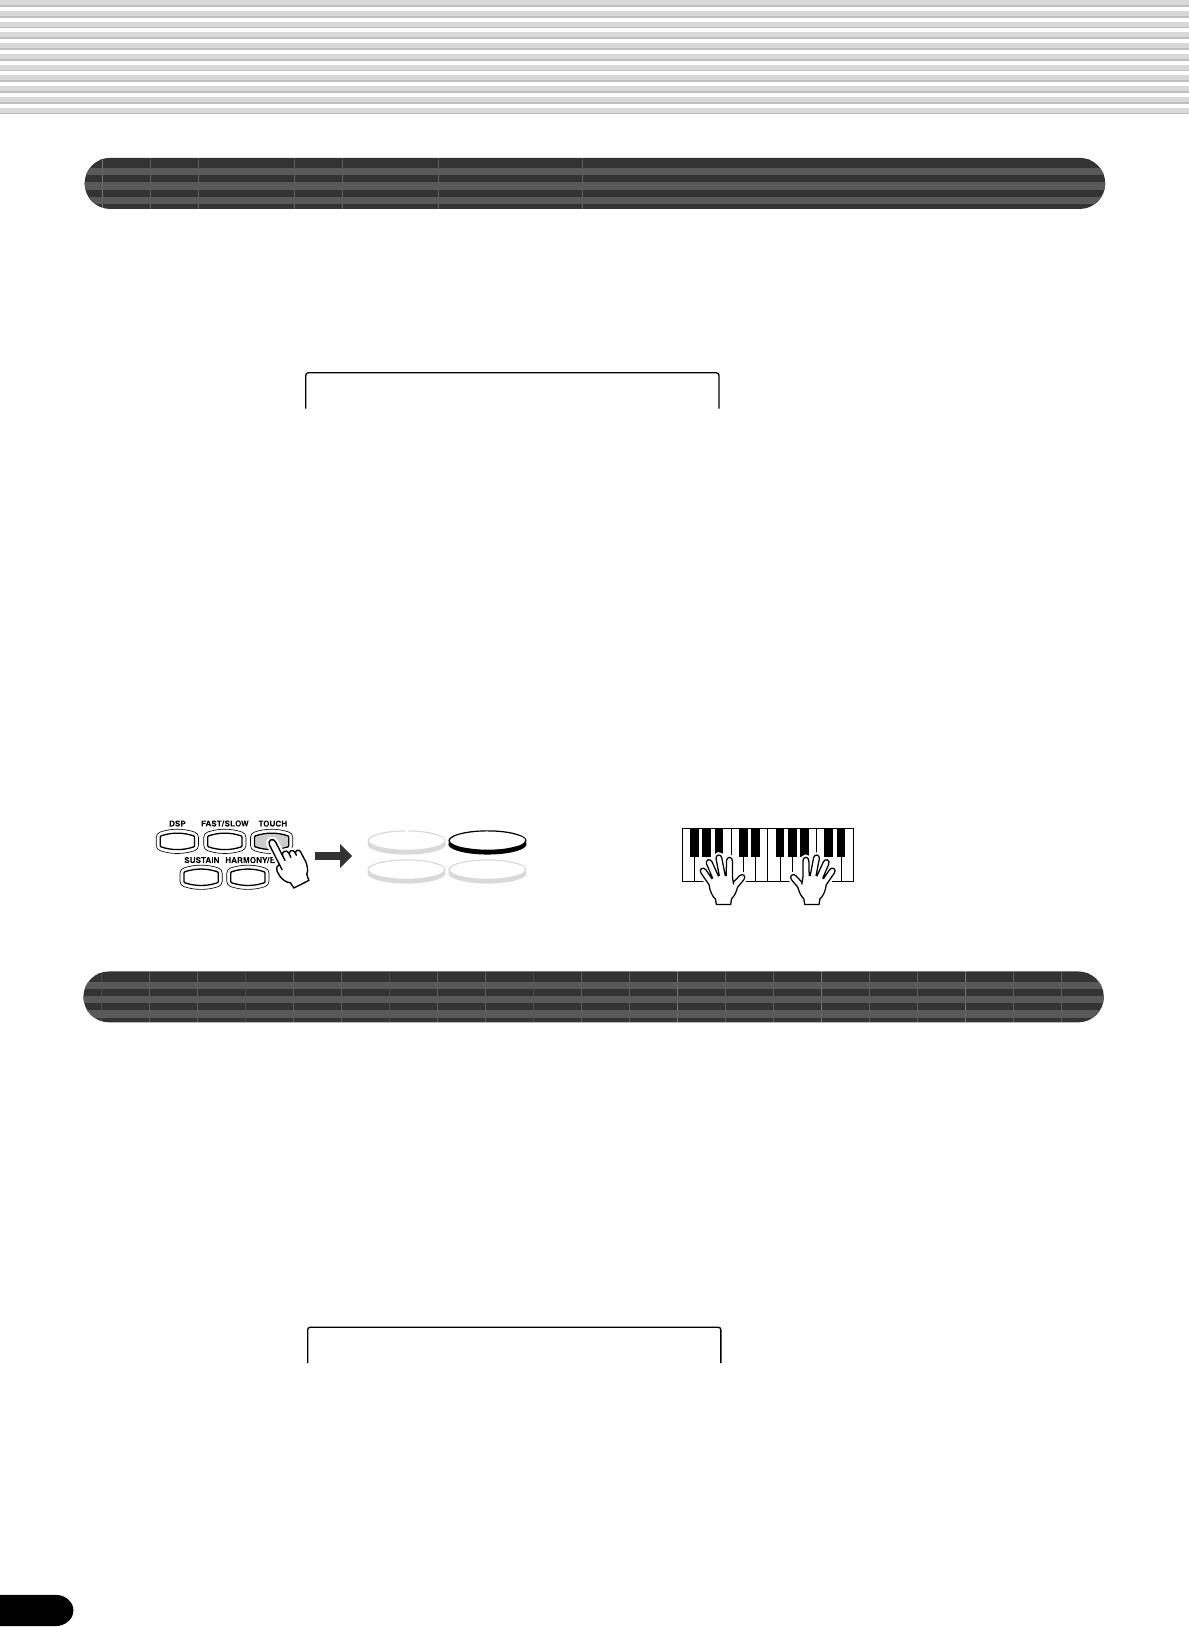 Yamaha Portatone Psr 540 Owners Manual 540_DK_cover